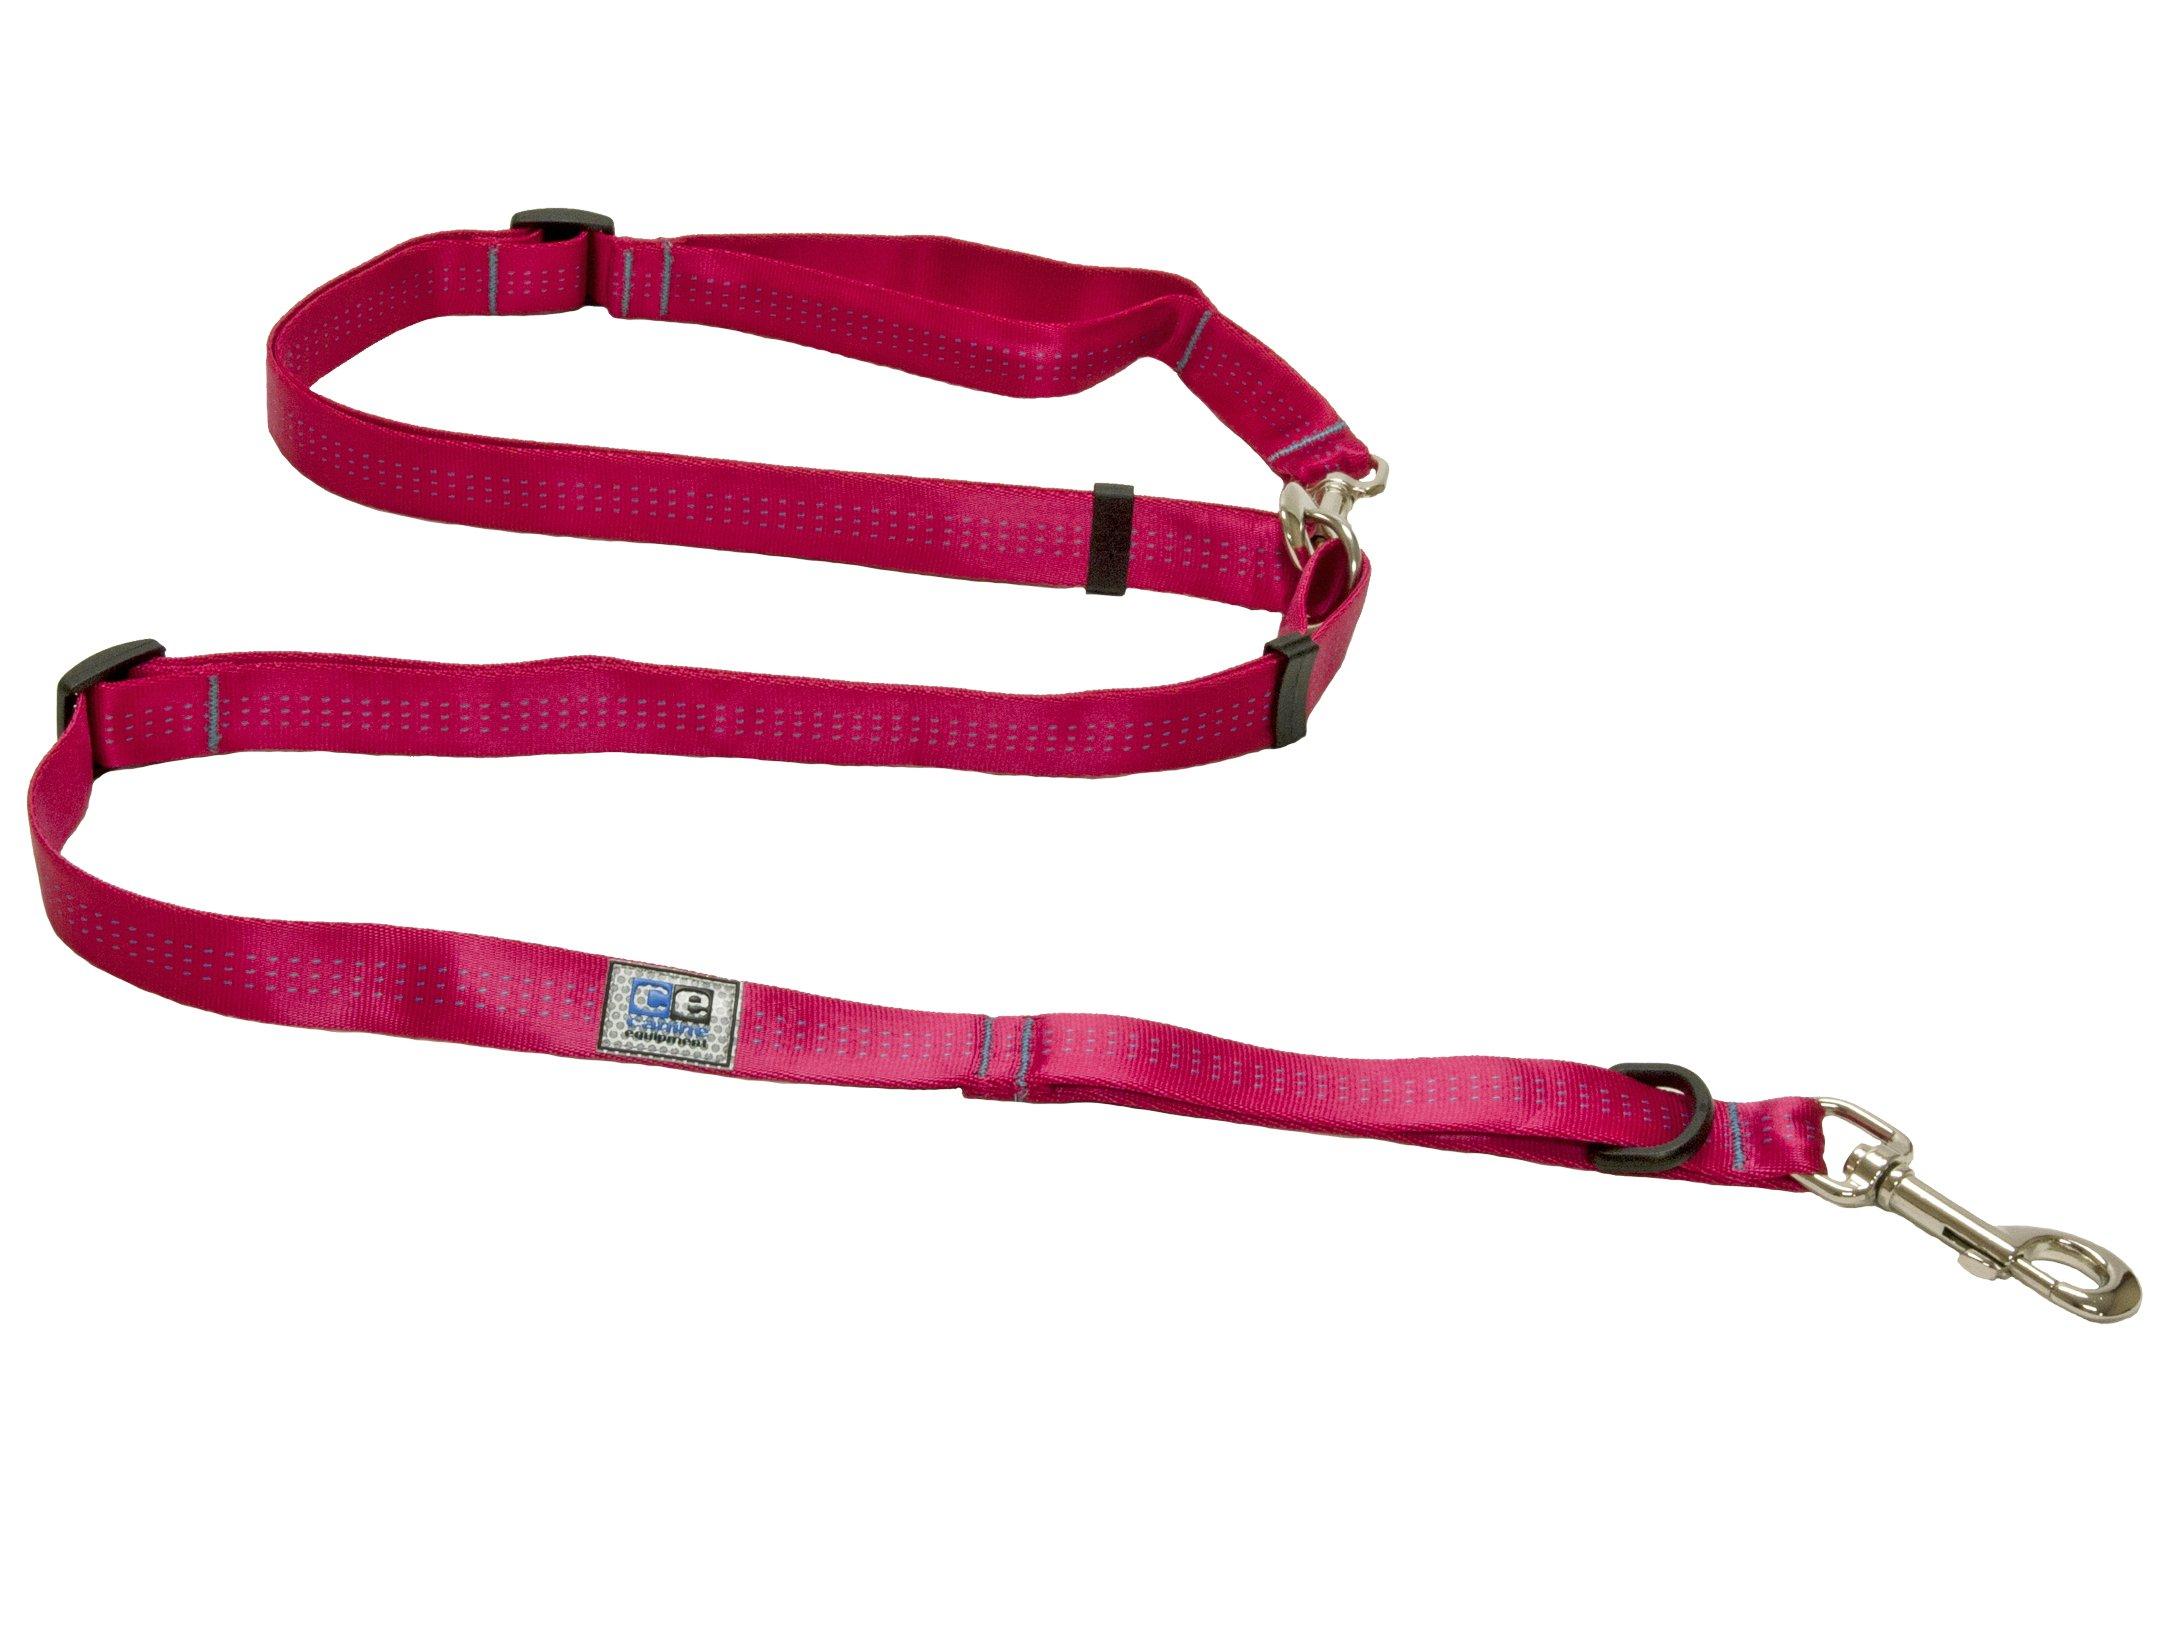 Canine Equipment 1-Inch Technika Beyond Control Dog Leash, Raspberry